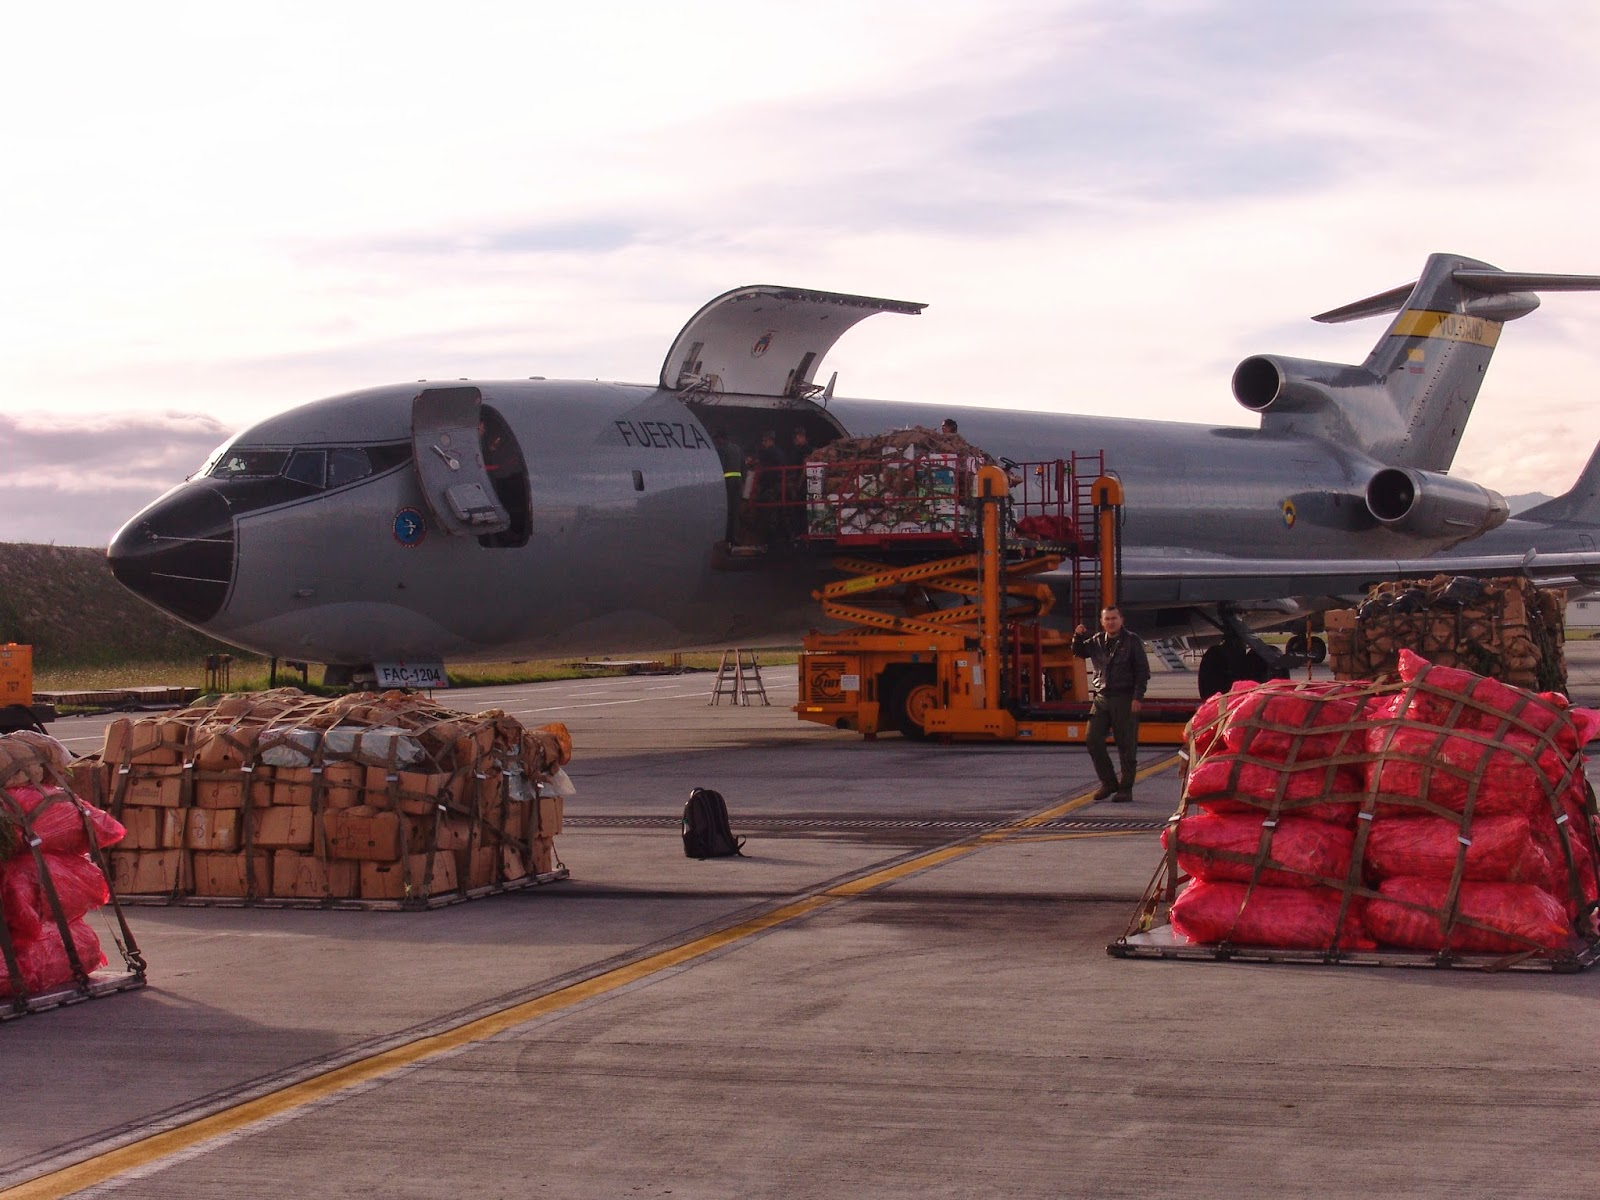 Industria Militar de Brasil - Página 3 Boeing+727-+puente+a%C3%A9reo+a+Caquet%C3%A1-Fuerza+A%C3%A9rea+Colombiana